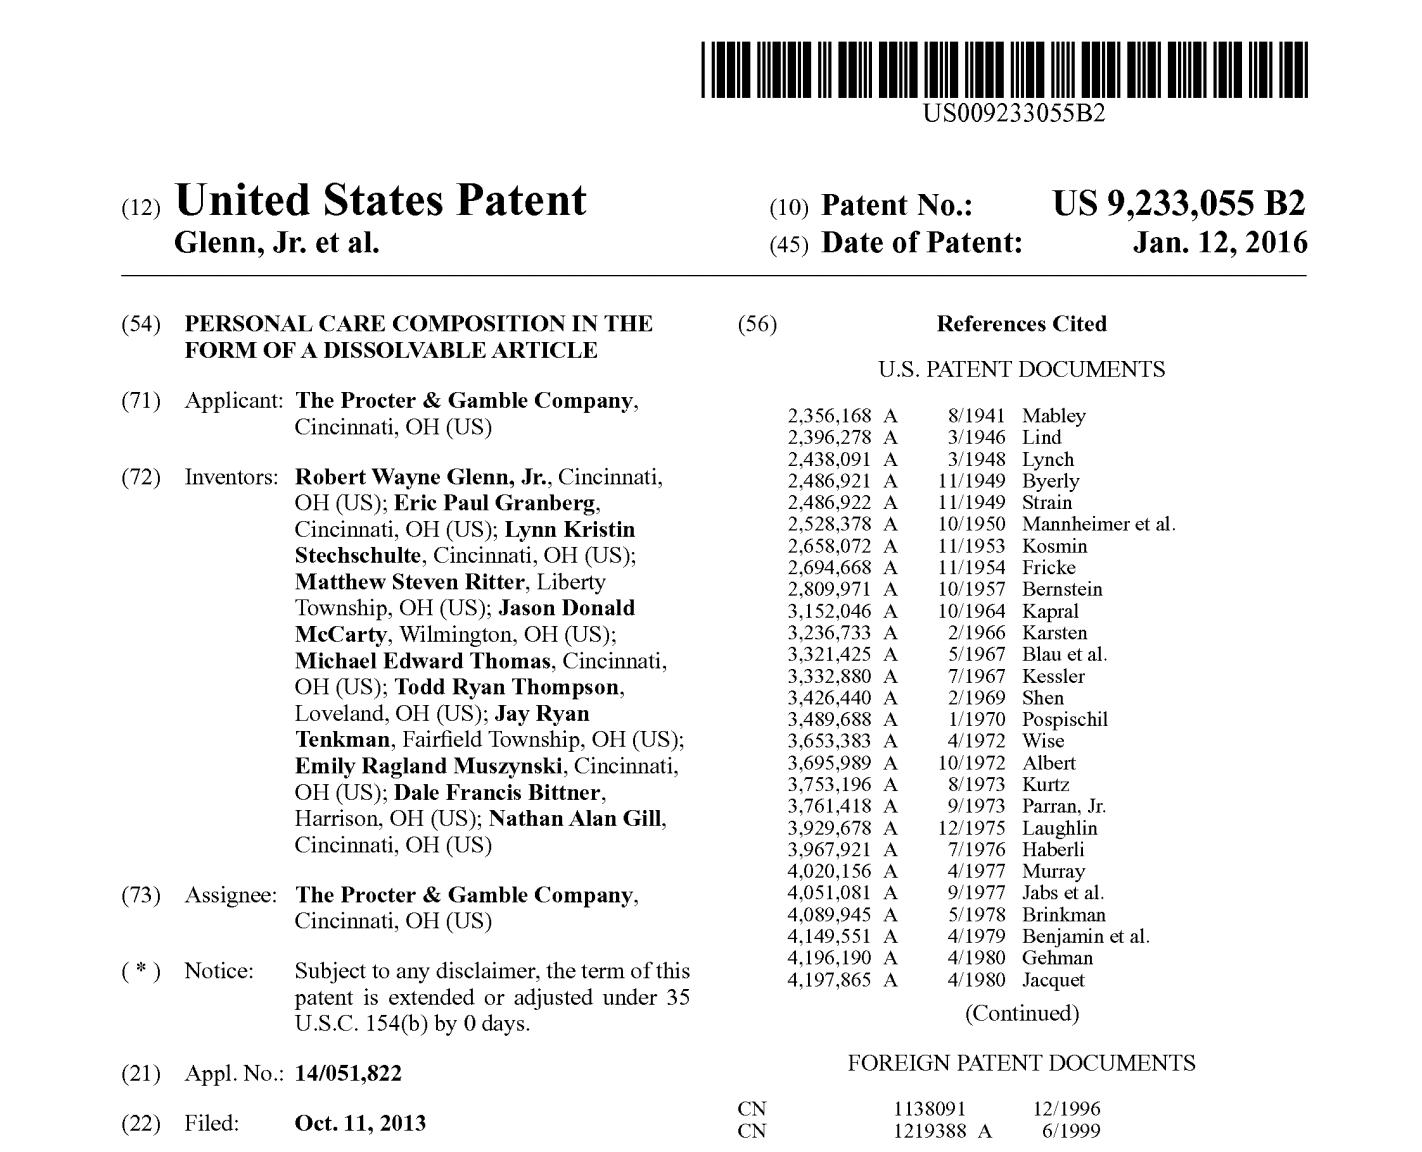 P&G patent